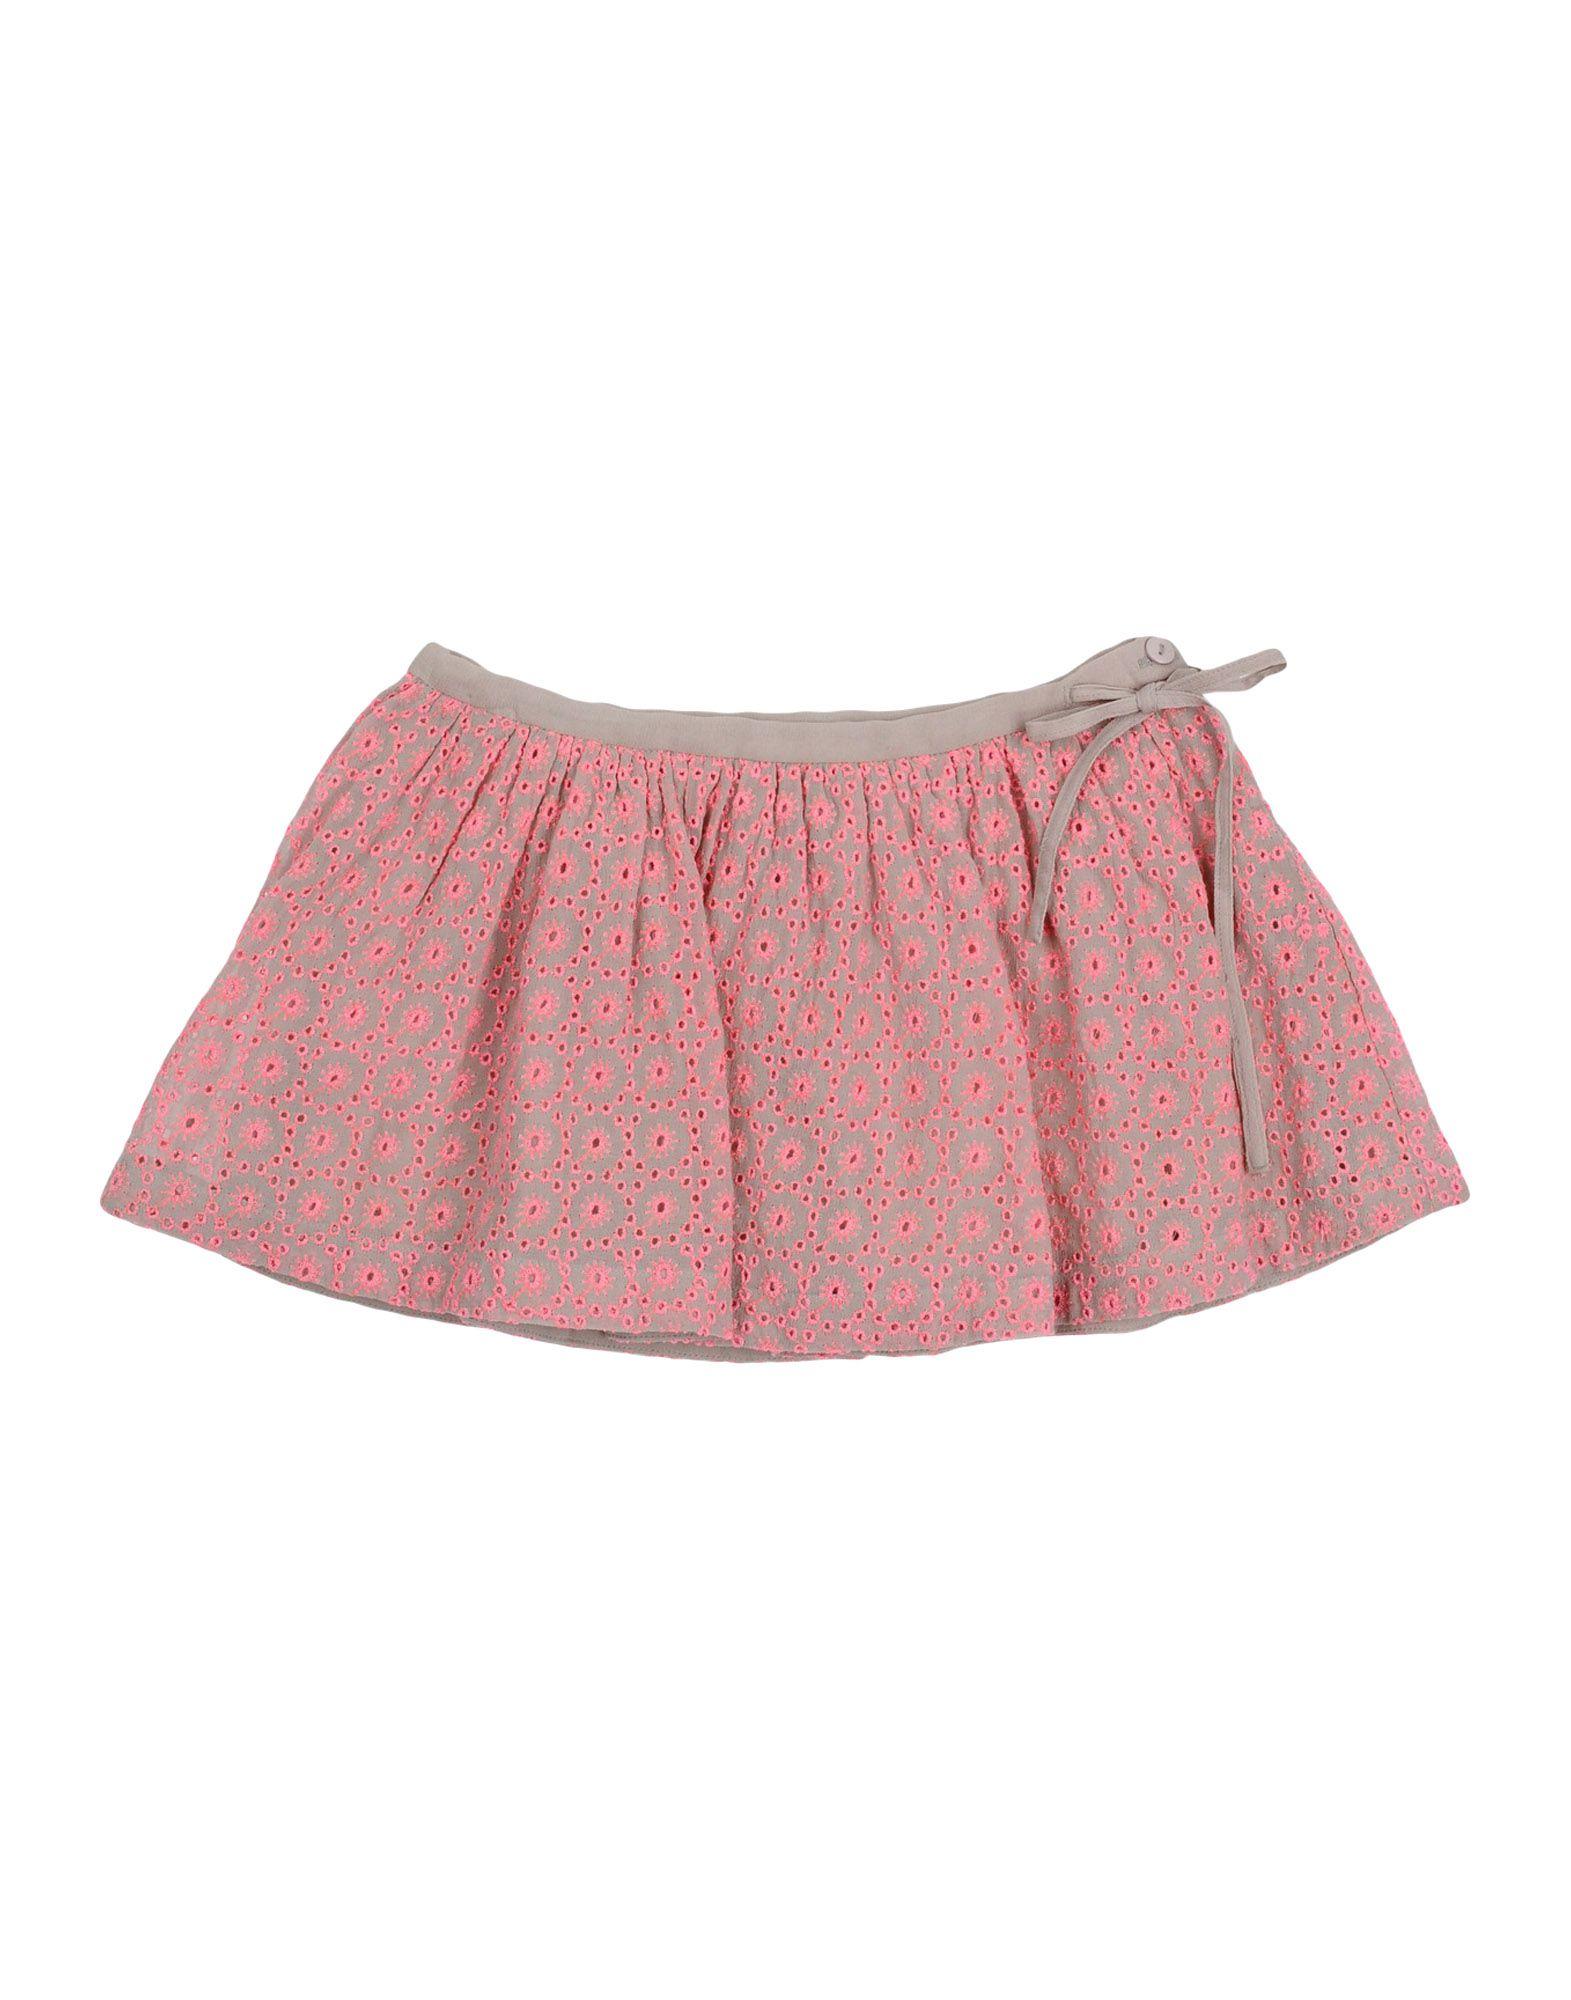 PREEN by THORNTON BREGAZZI Mädchen 0-24 monate Rock Farbe Rosa Größe 10